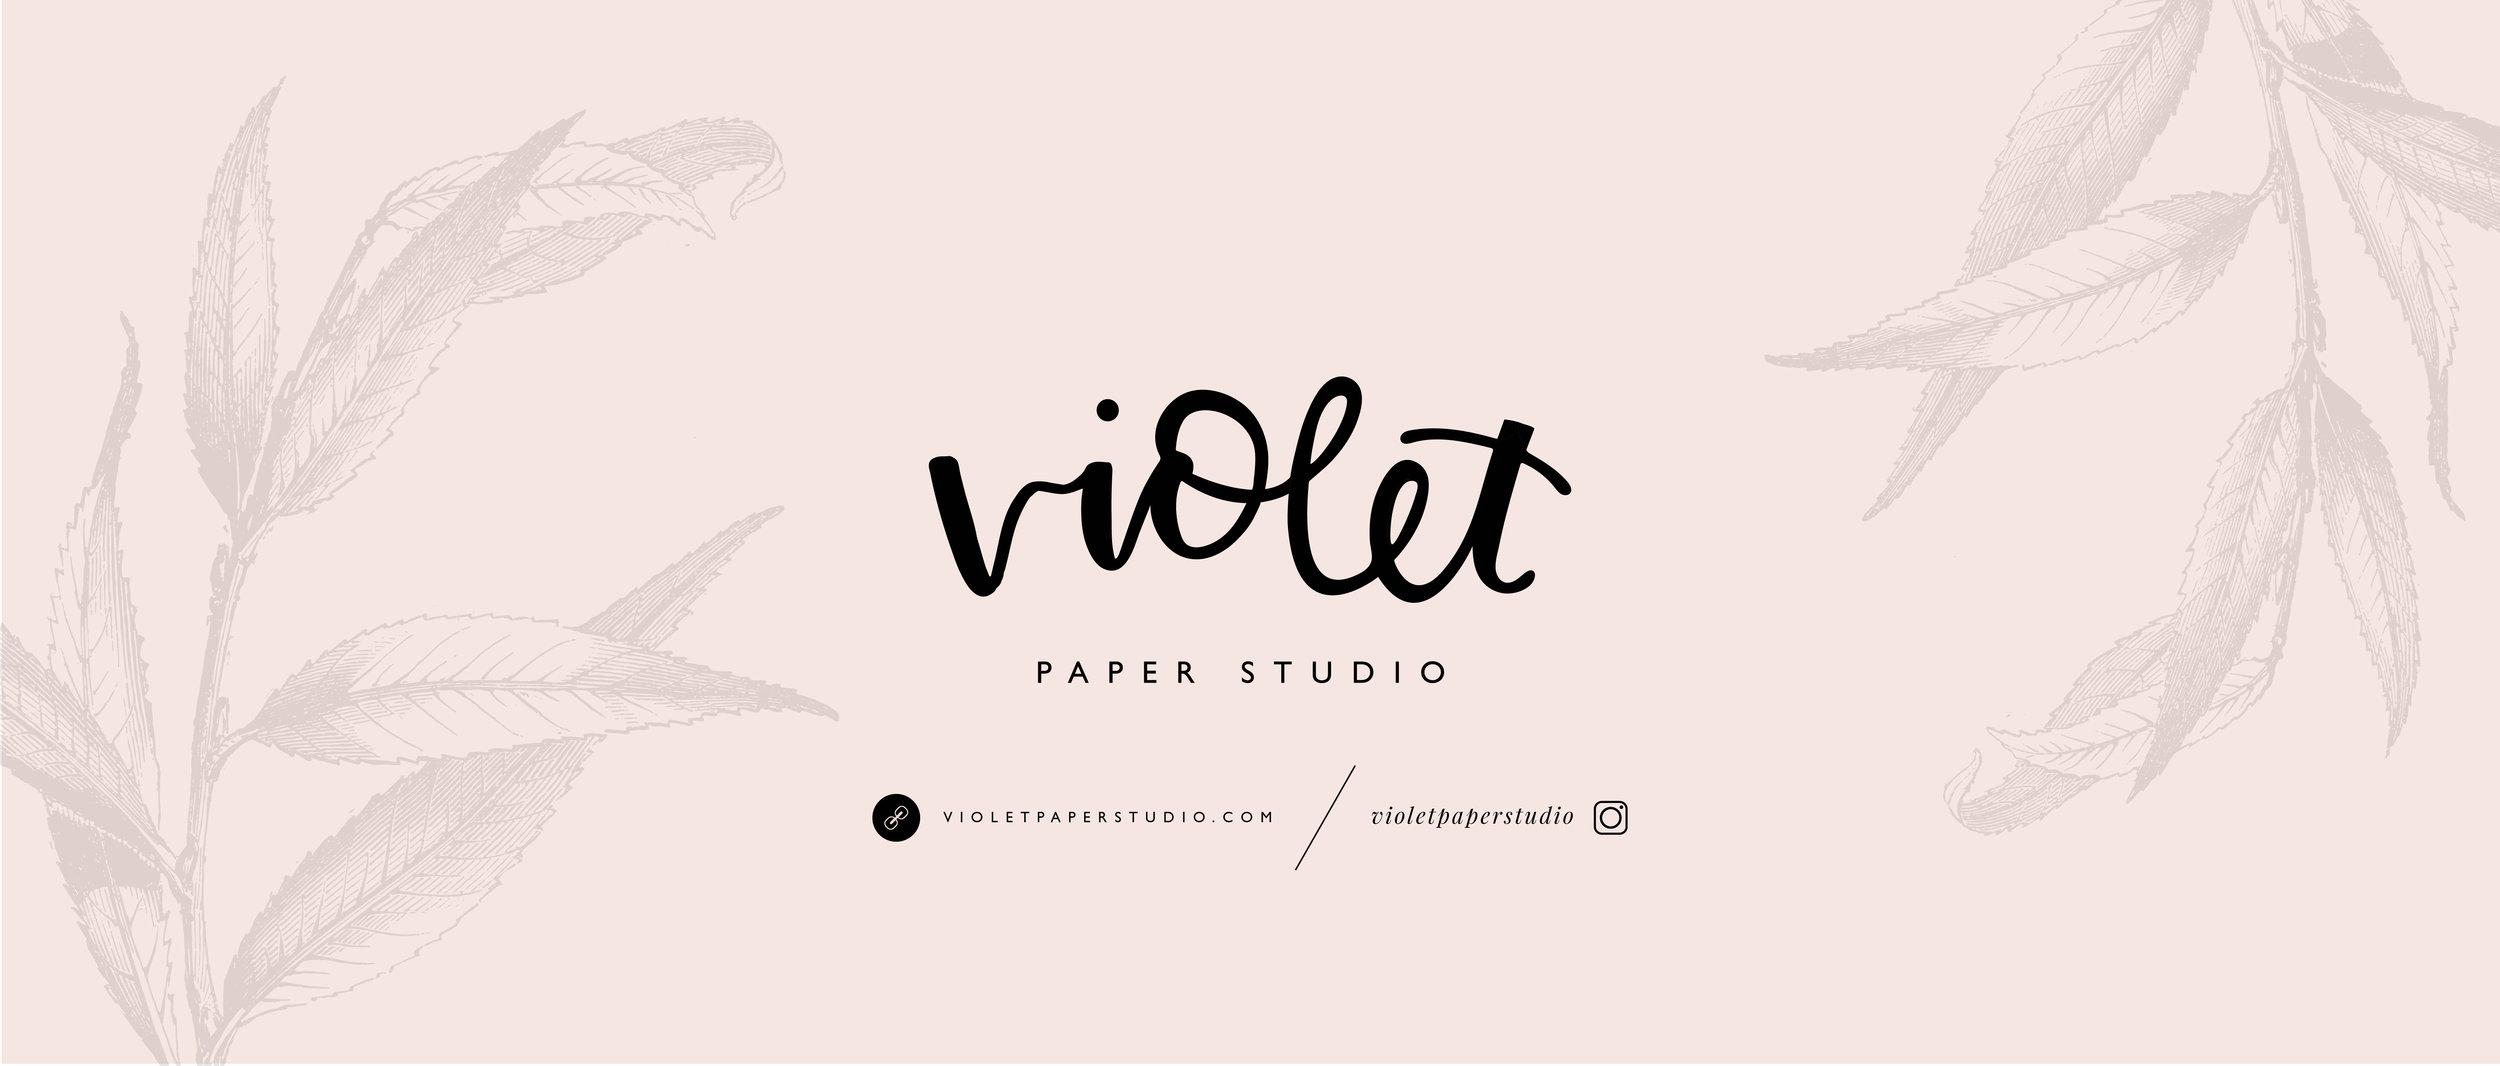 violet paper studio-09-09.jpg